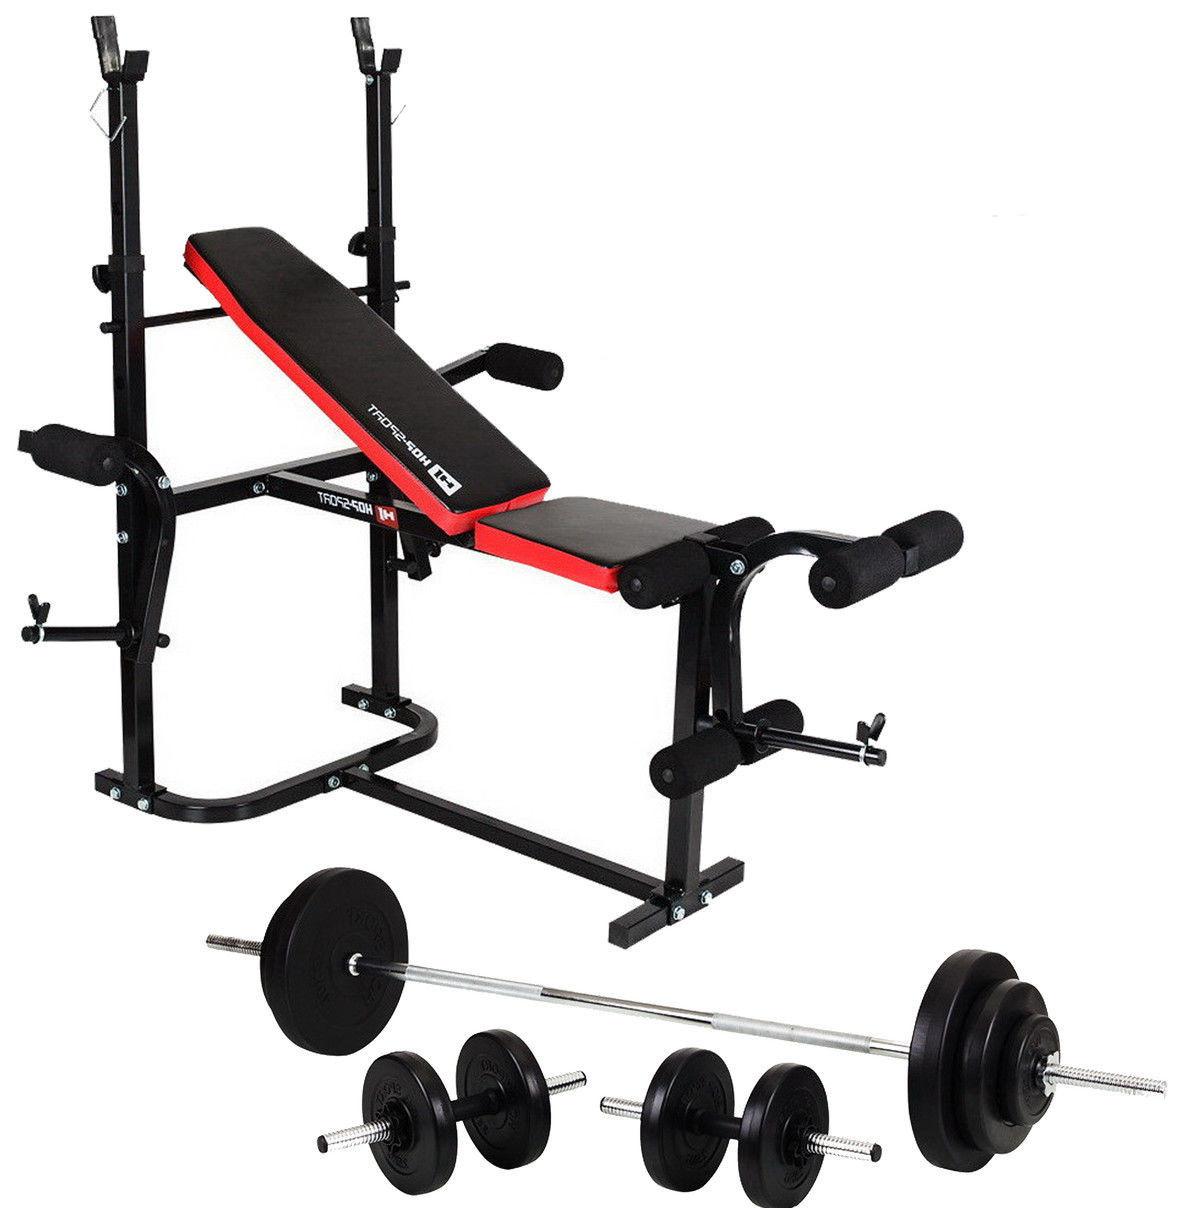 Скамья для жима Hop Sport 1020 + Штанга 70 кг + Гантели 2 х 21 кг